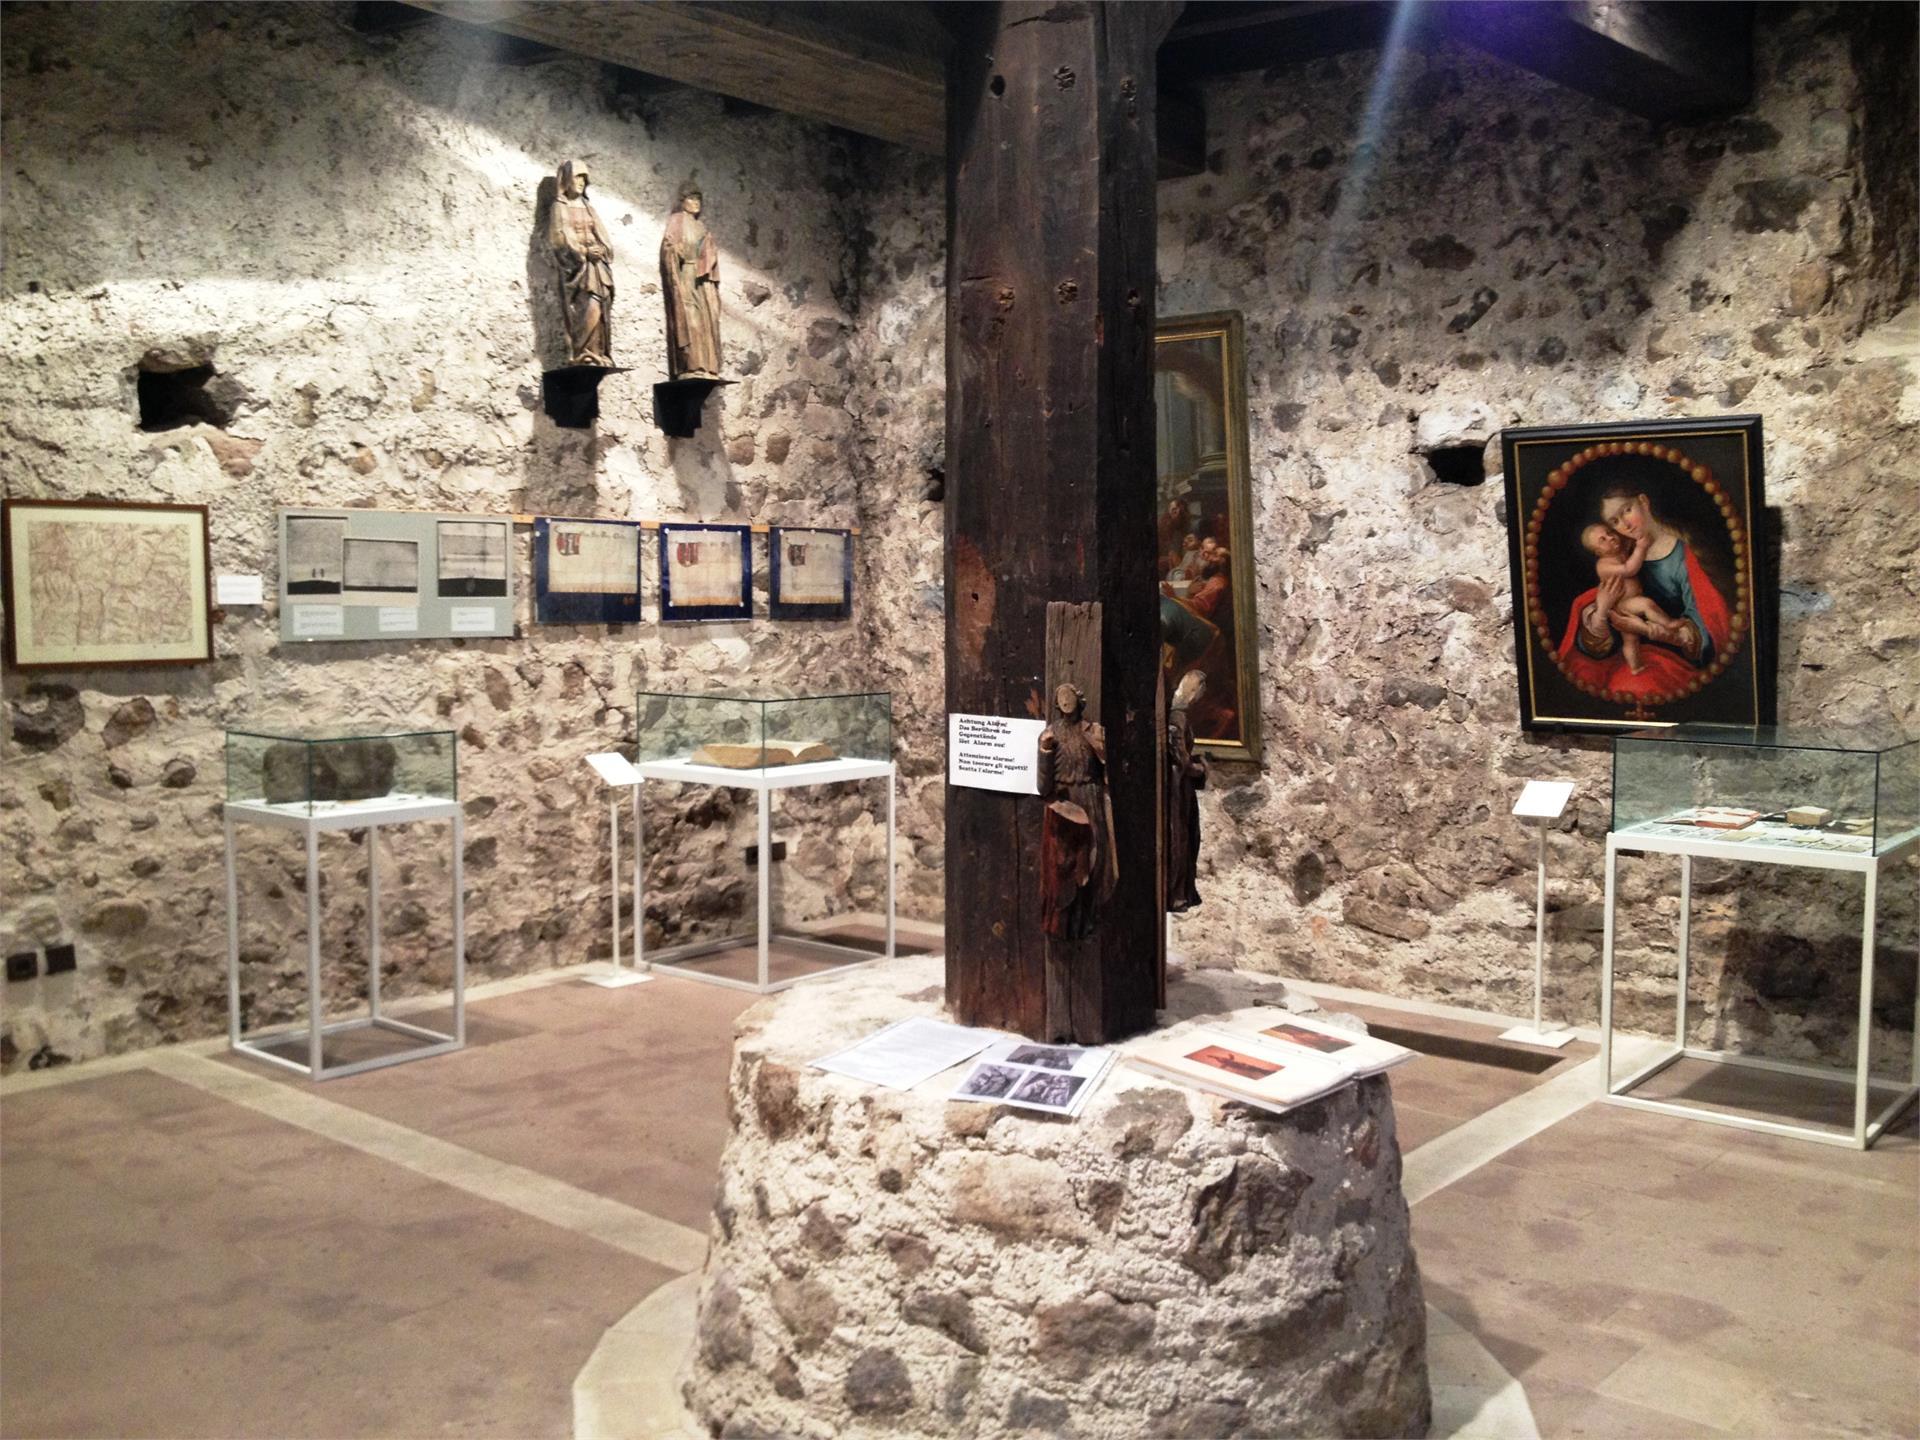 Museum Castel Thurn of Nova Ponente/Deutschnofen